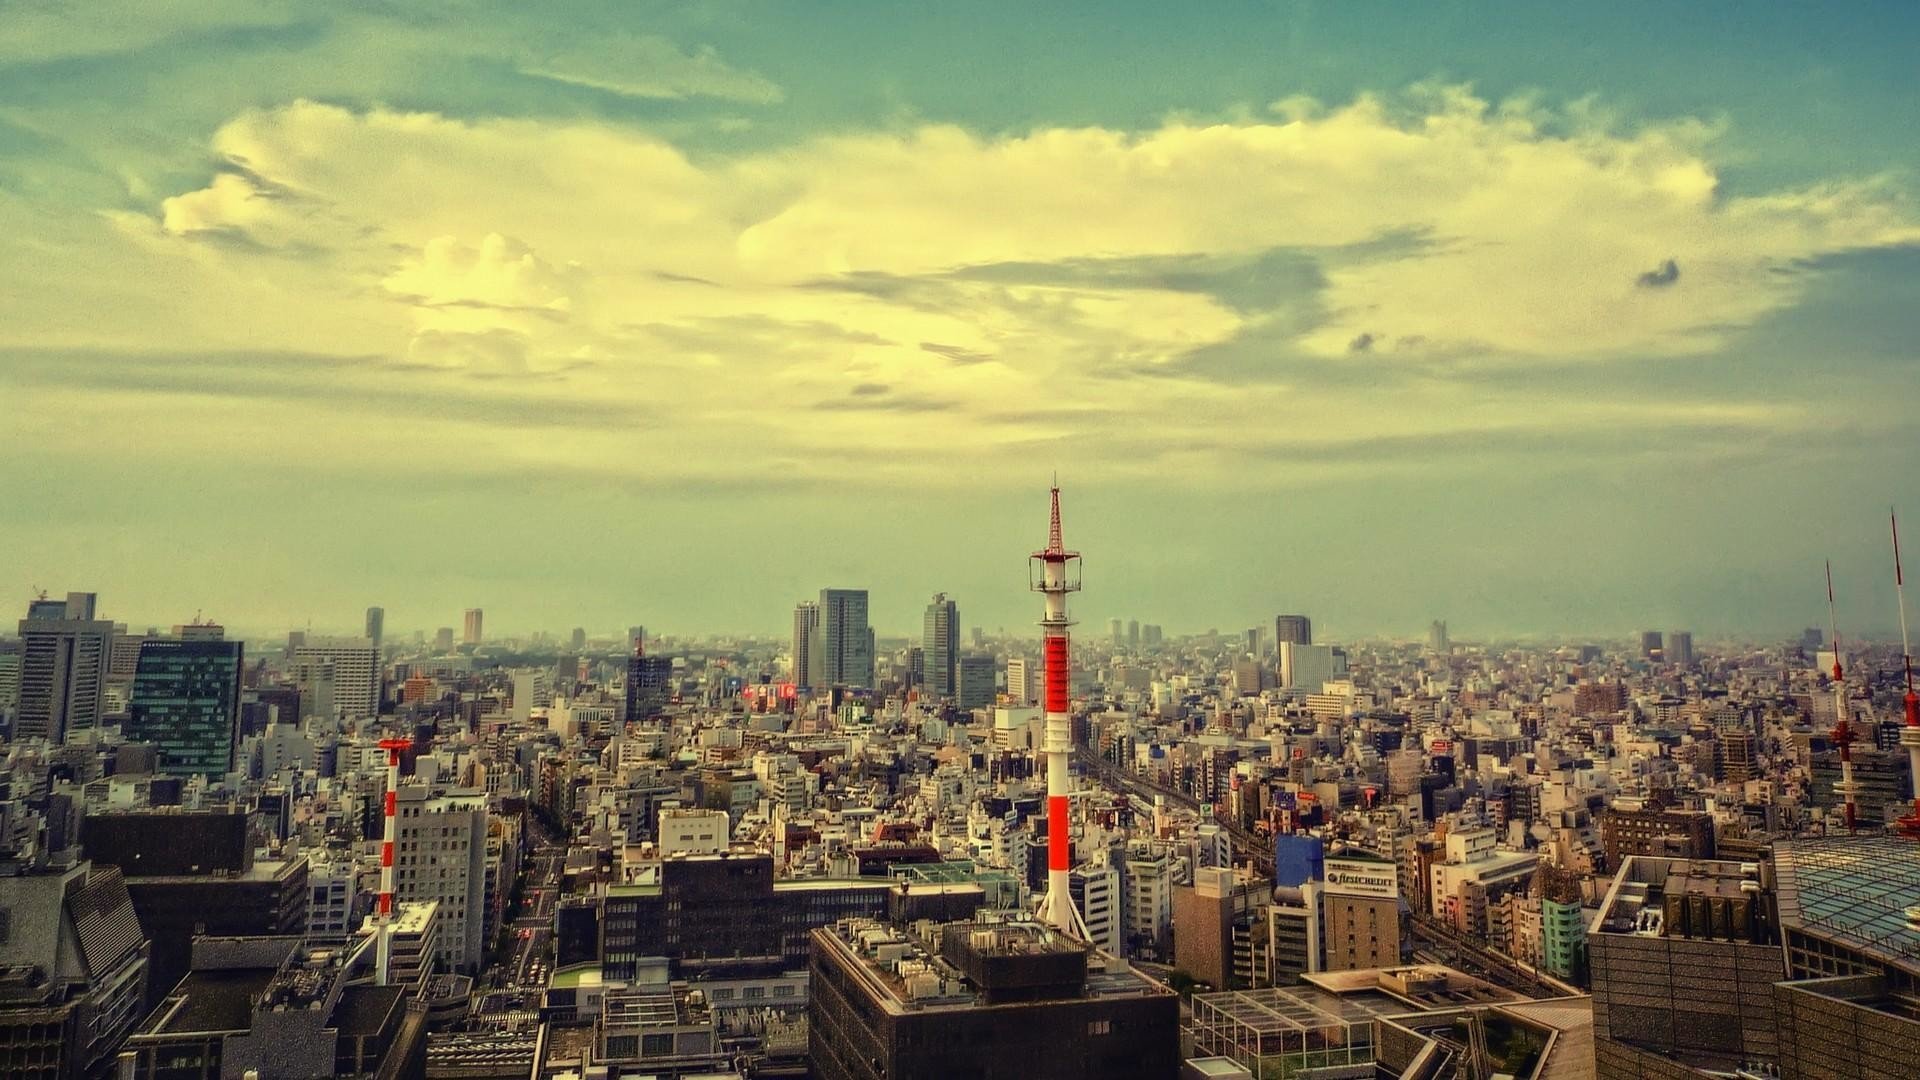 City Skyline wallpaper 177858